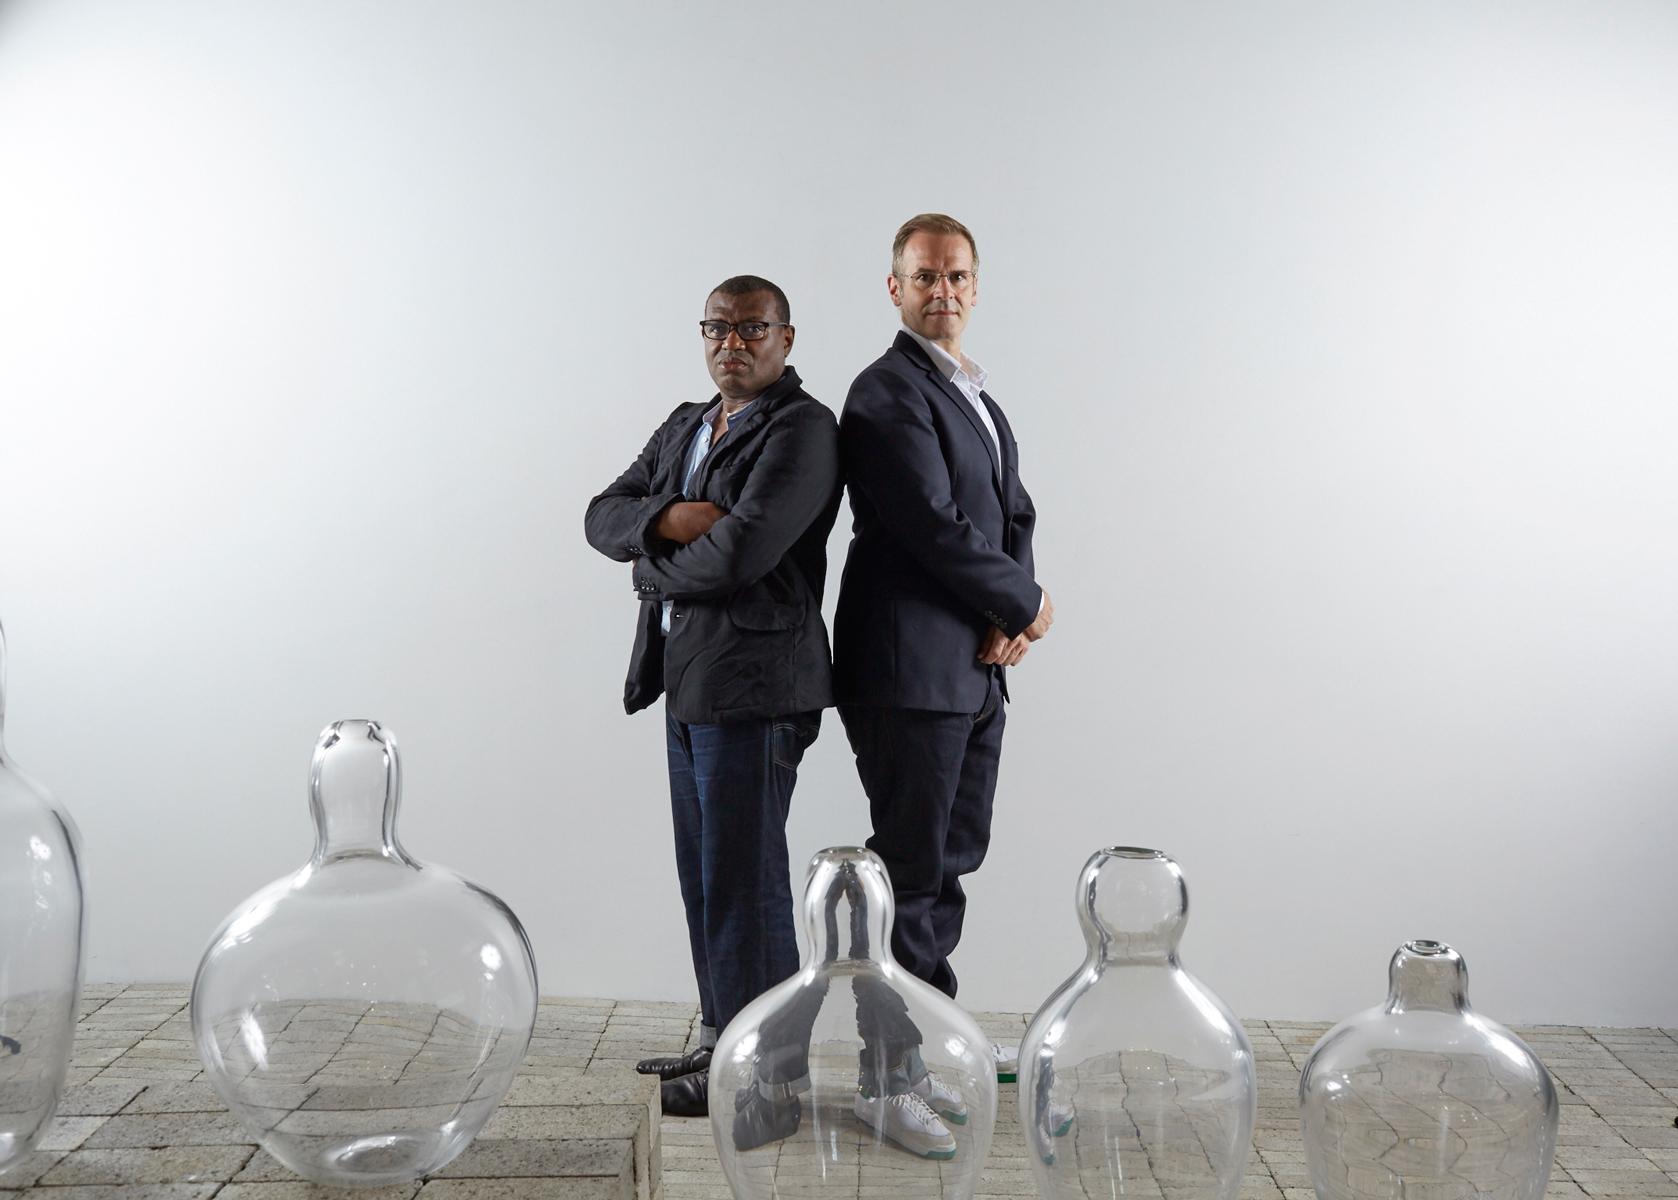 Ron Anderson & David Rees